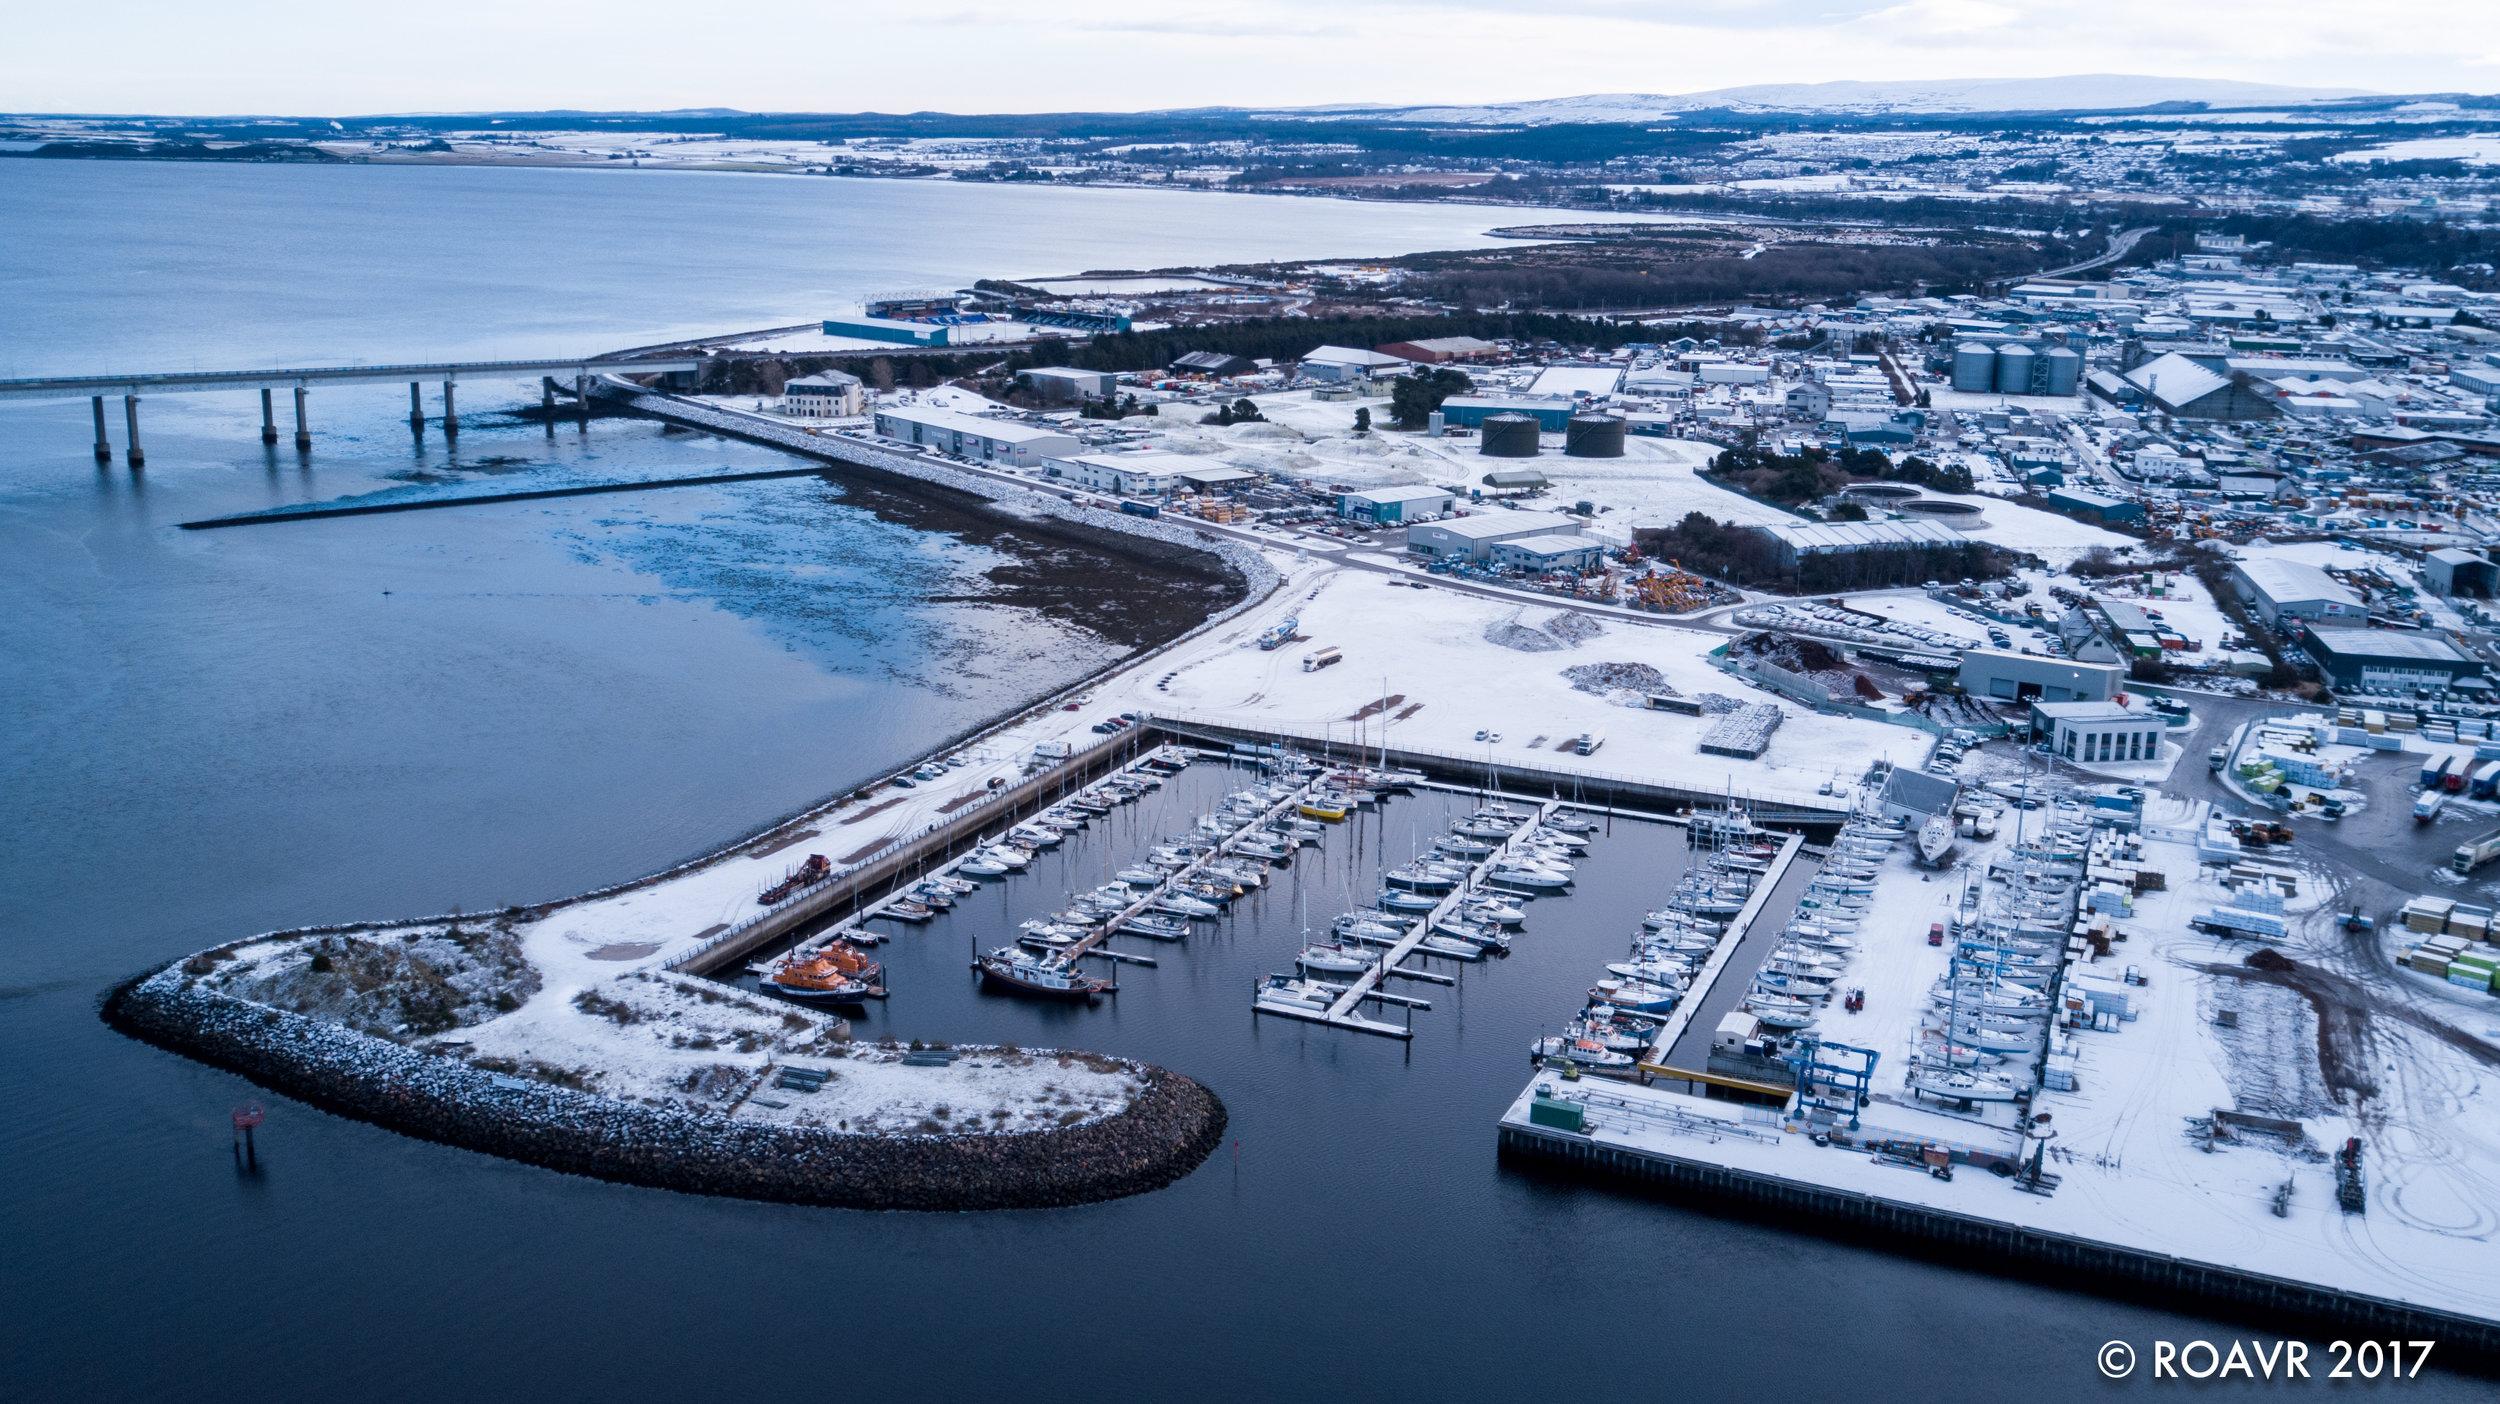 Inverness Marina - Inverness, January 2018